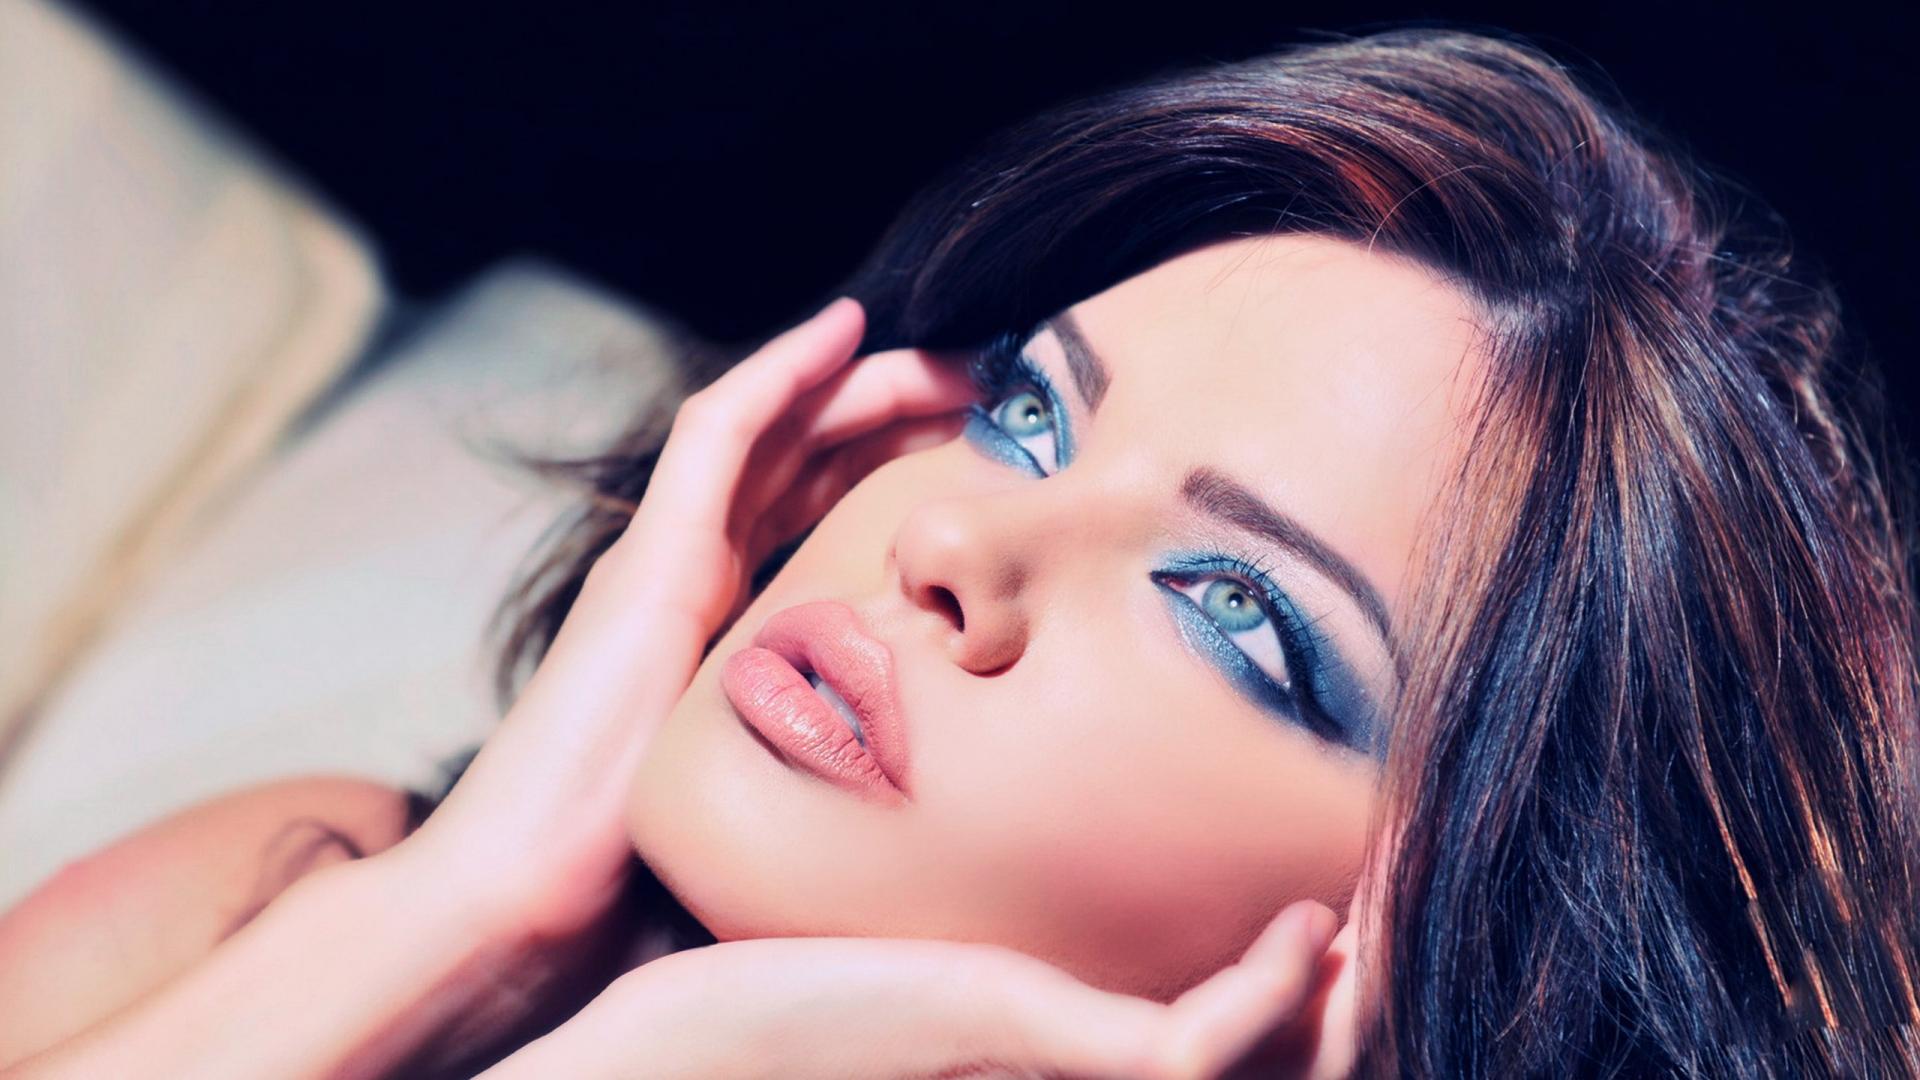 animated makeup wallpaper - photo #31